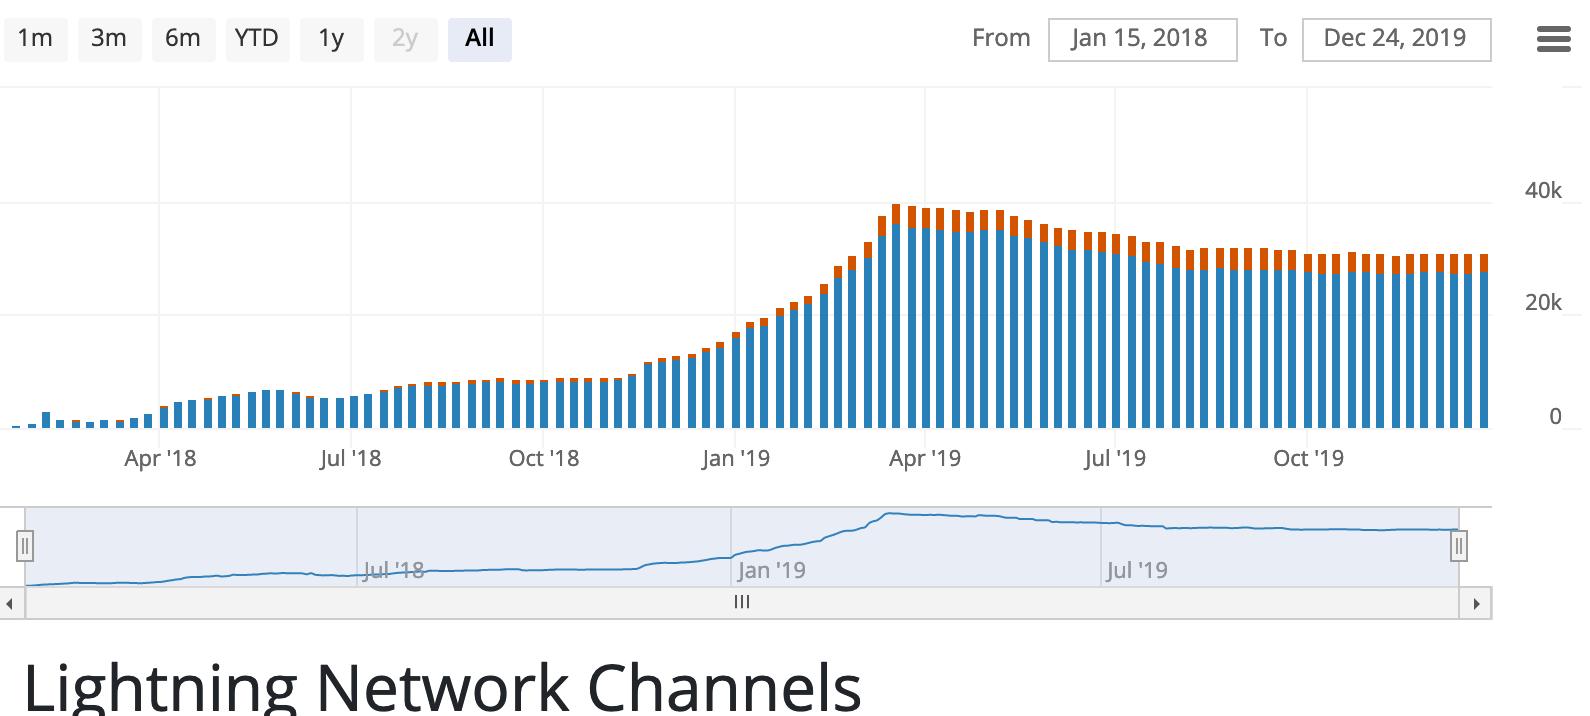 LN Channels | Source: Bitcoin Visuals